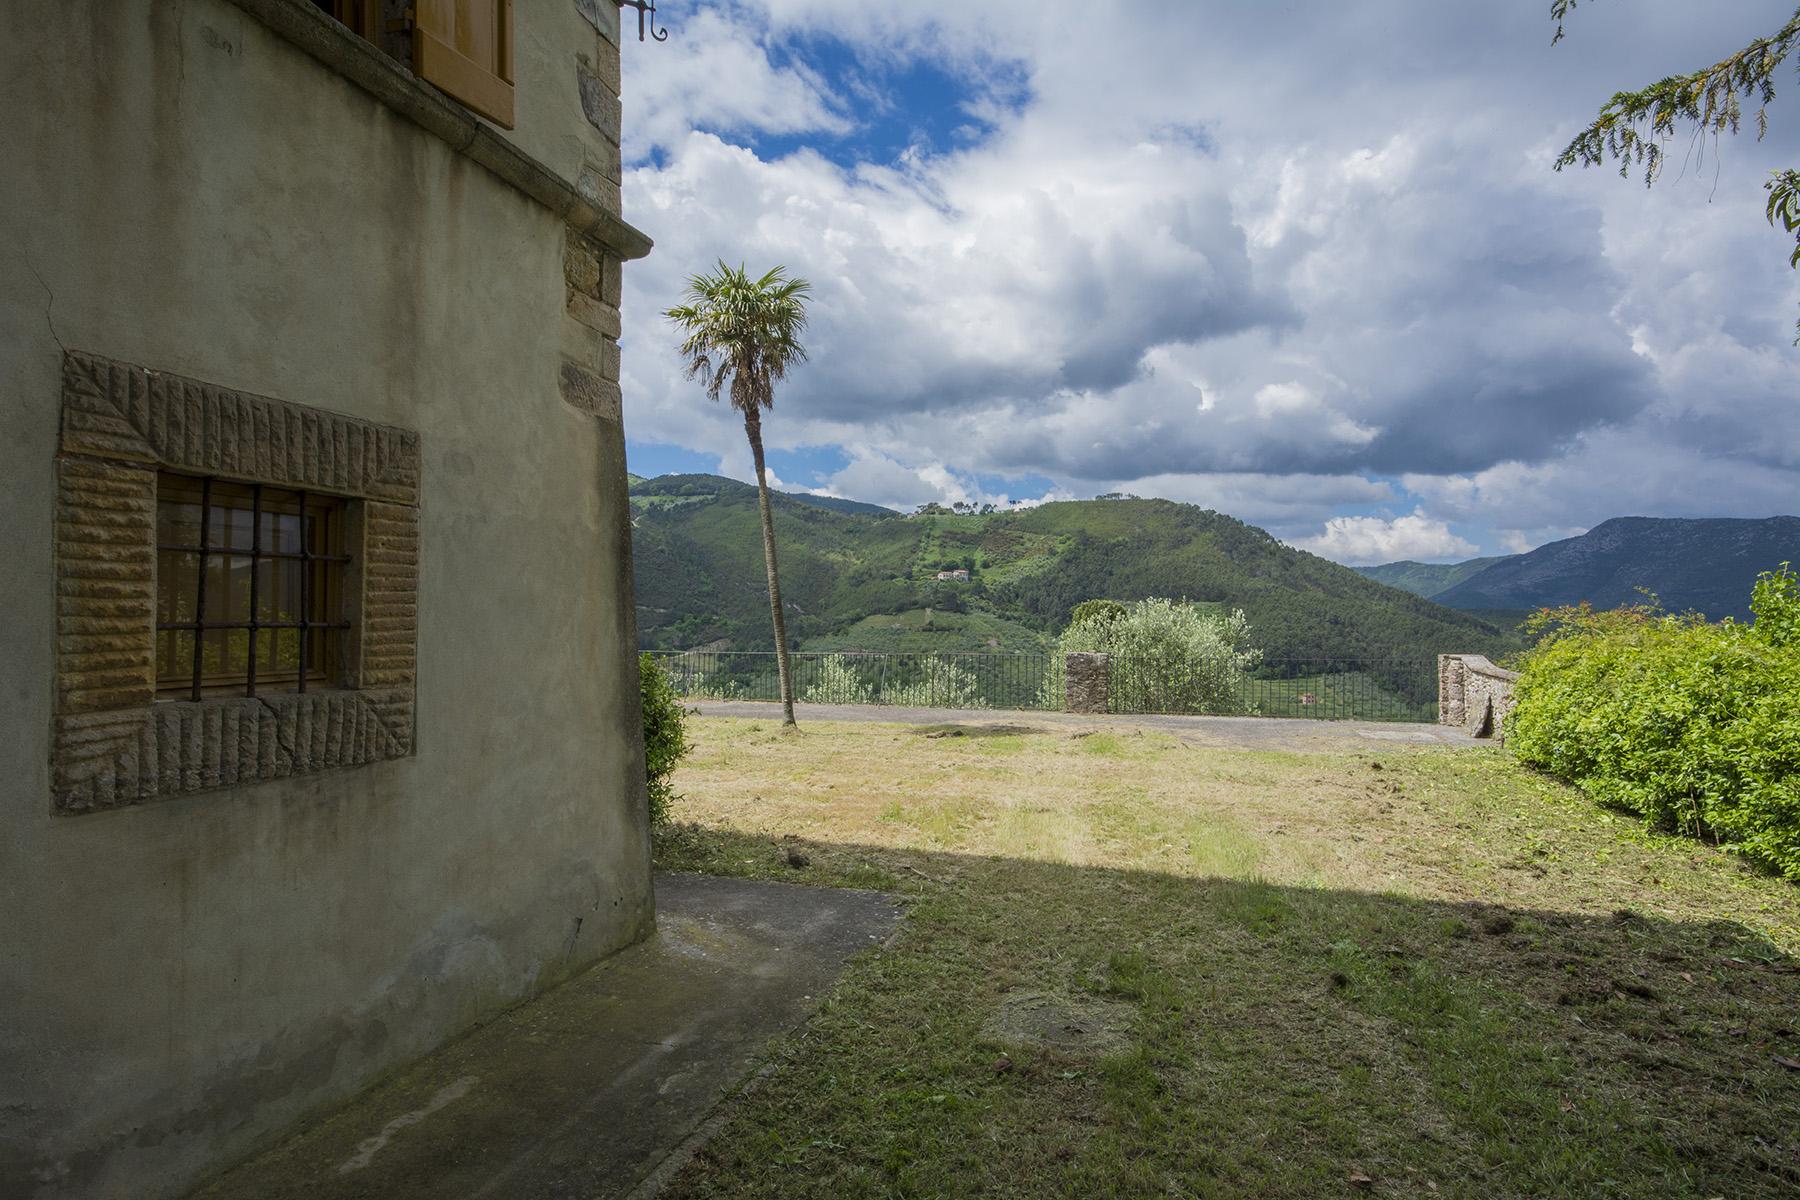 Villa in Vendita a Capannori: 5 locali, 490 mq - Foto 17